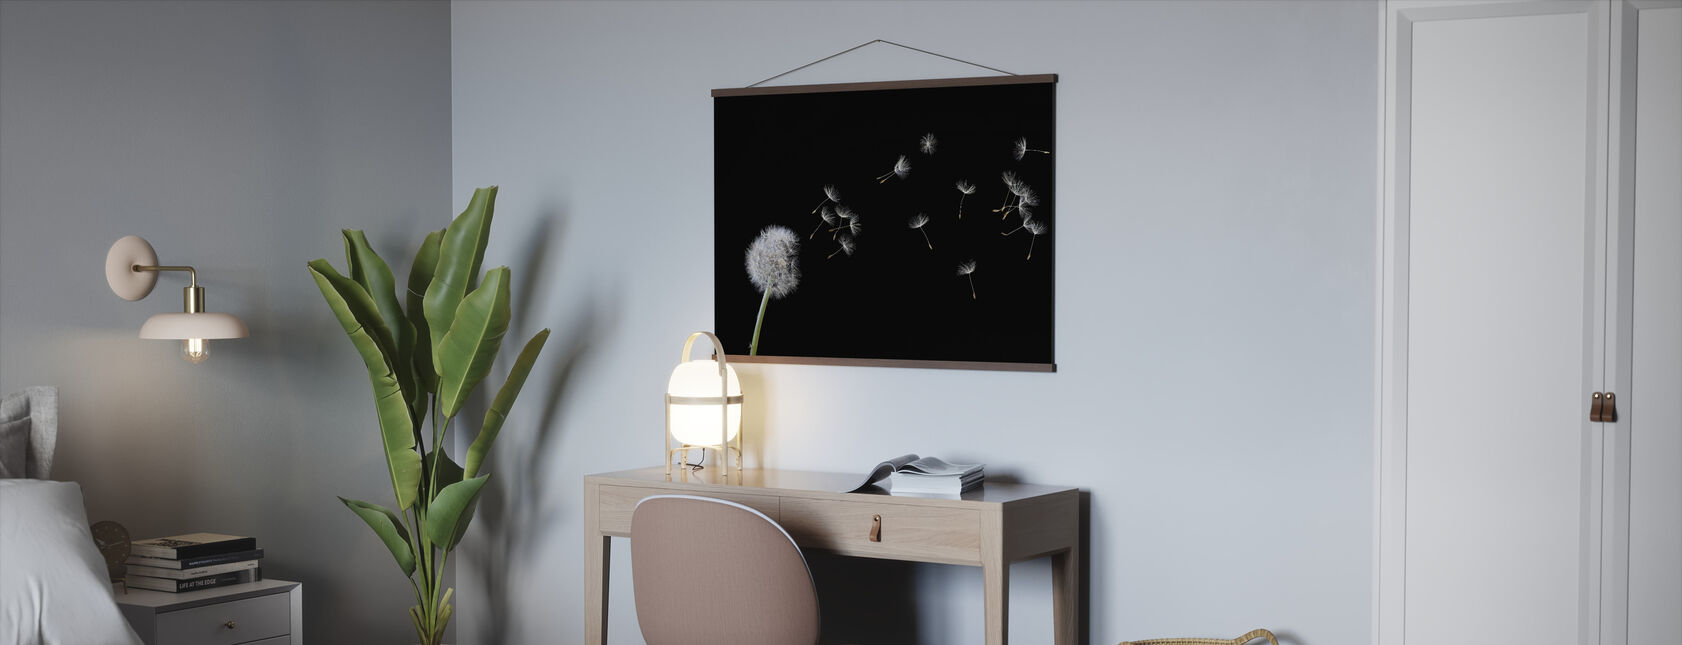 Blown Dandelion - Poster - Office